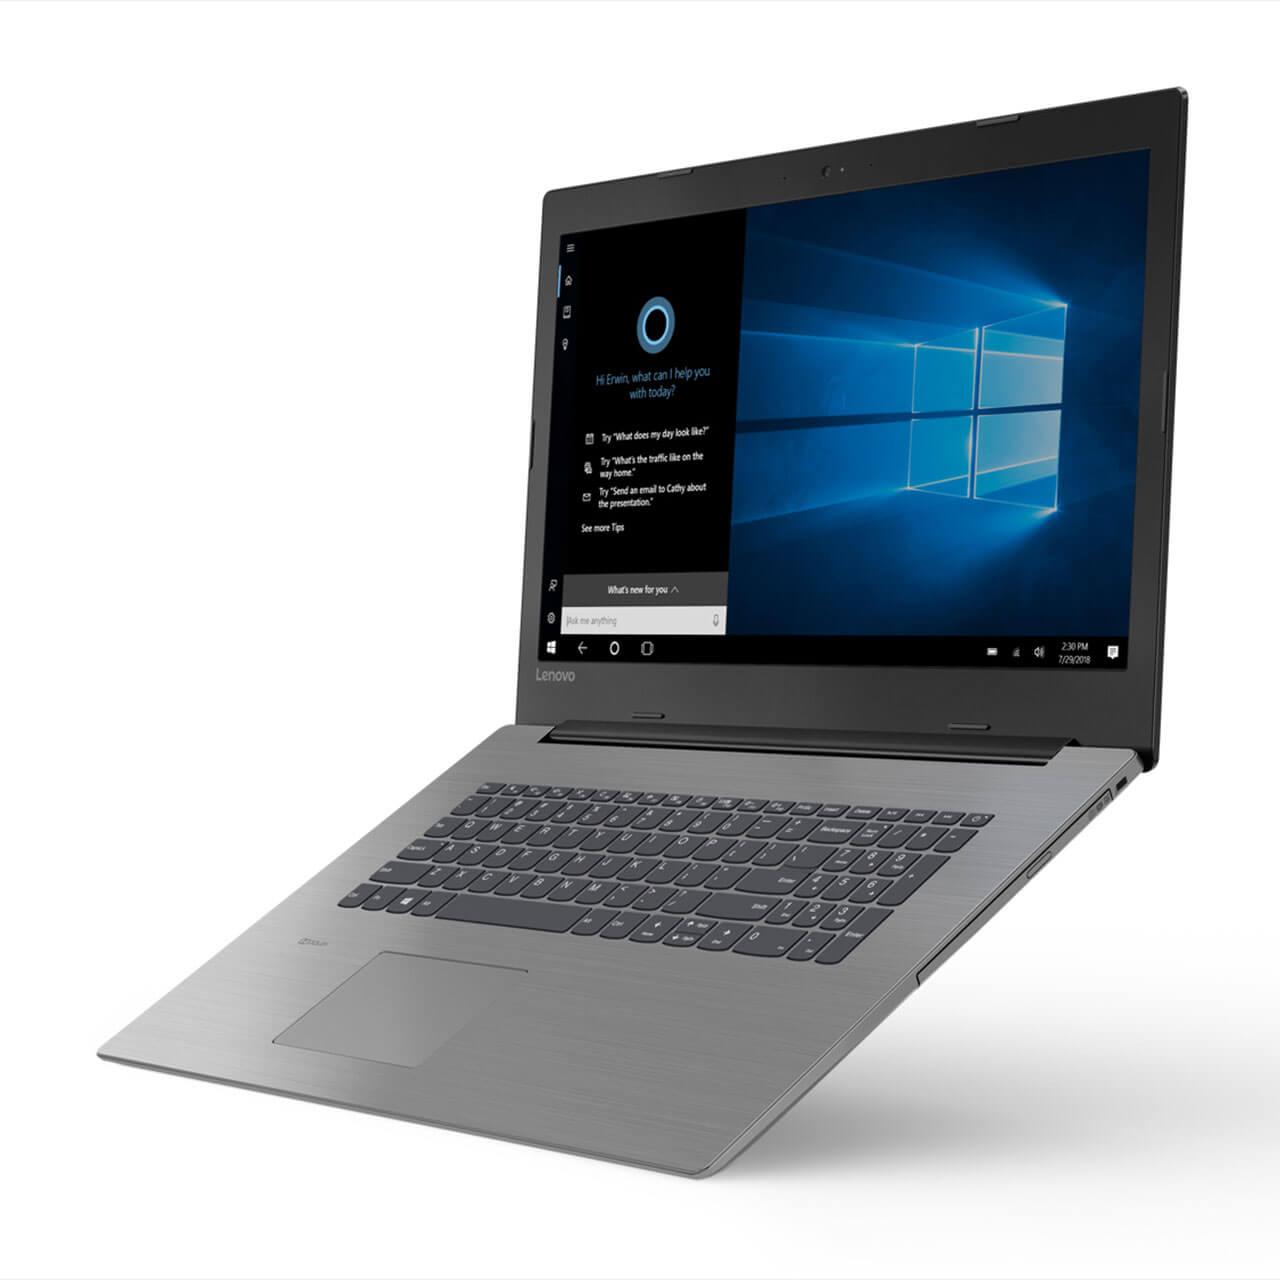 "Lenovo Ideapad 330, 17.3"", i5-8250U, 12 GB RAM, 2TB 5400 RPM, Win 10 Home 64 1"